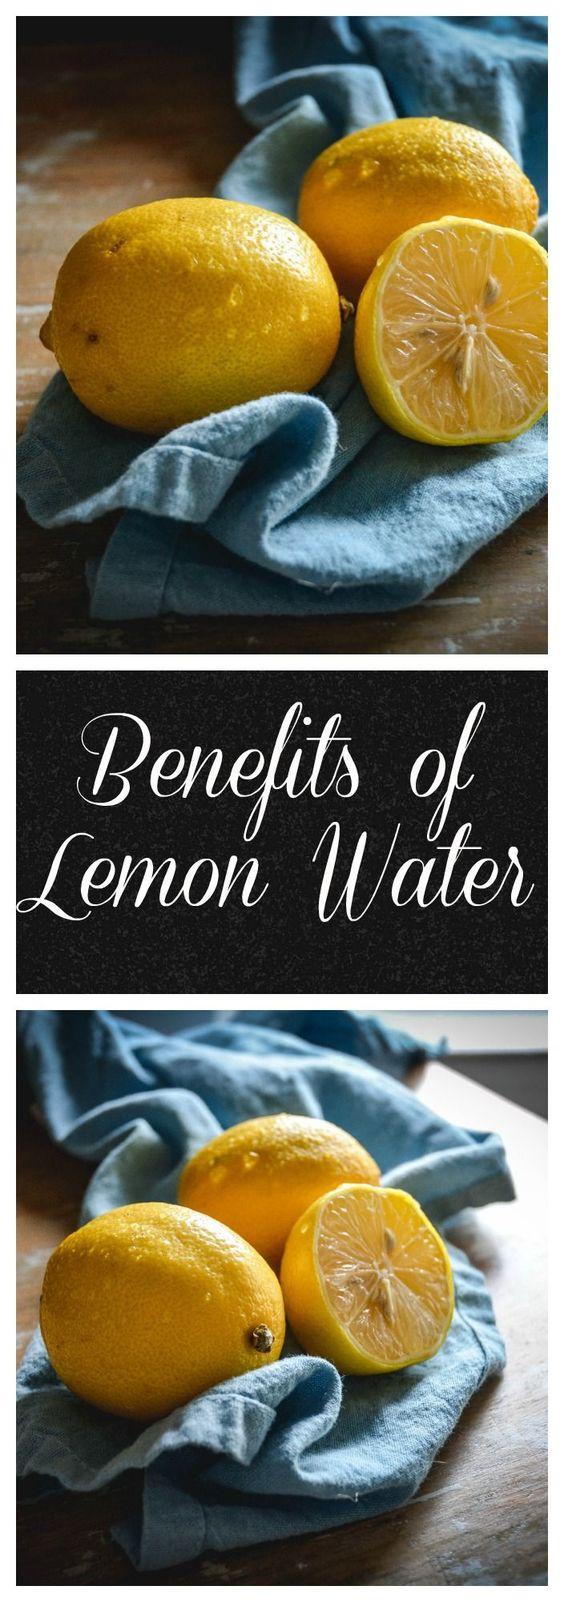 Lemon water benefits 11062